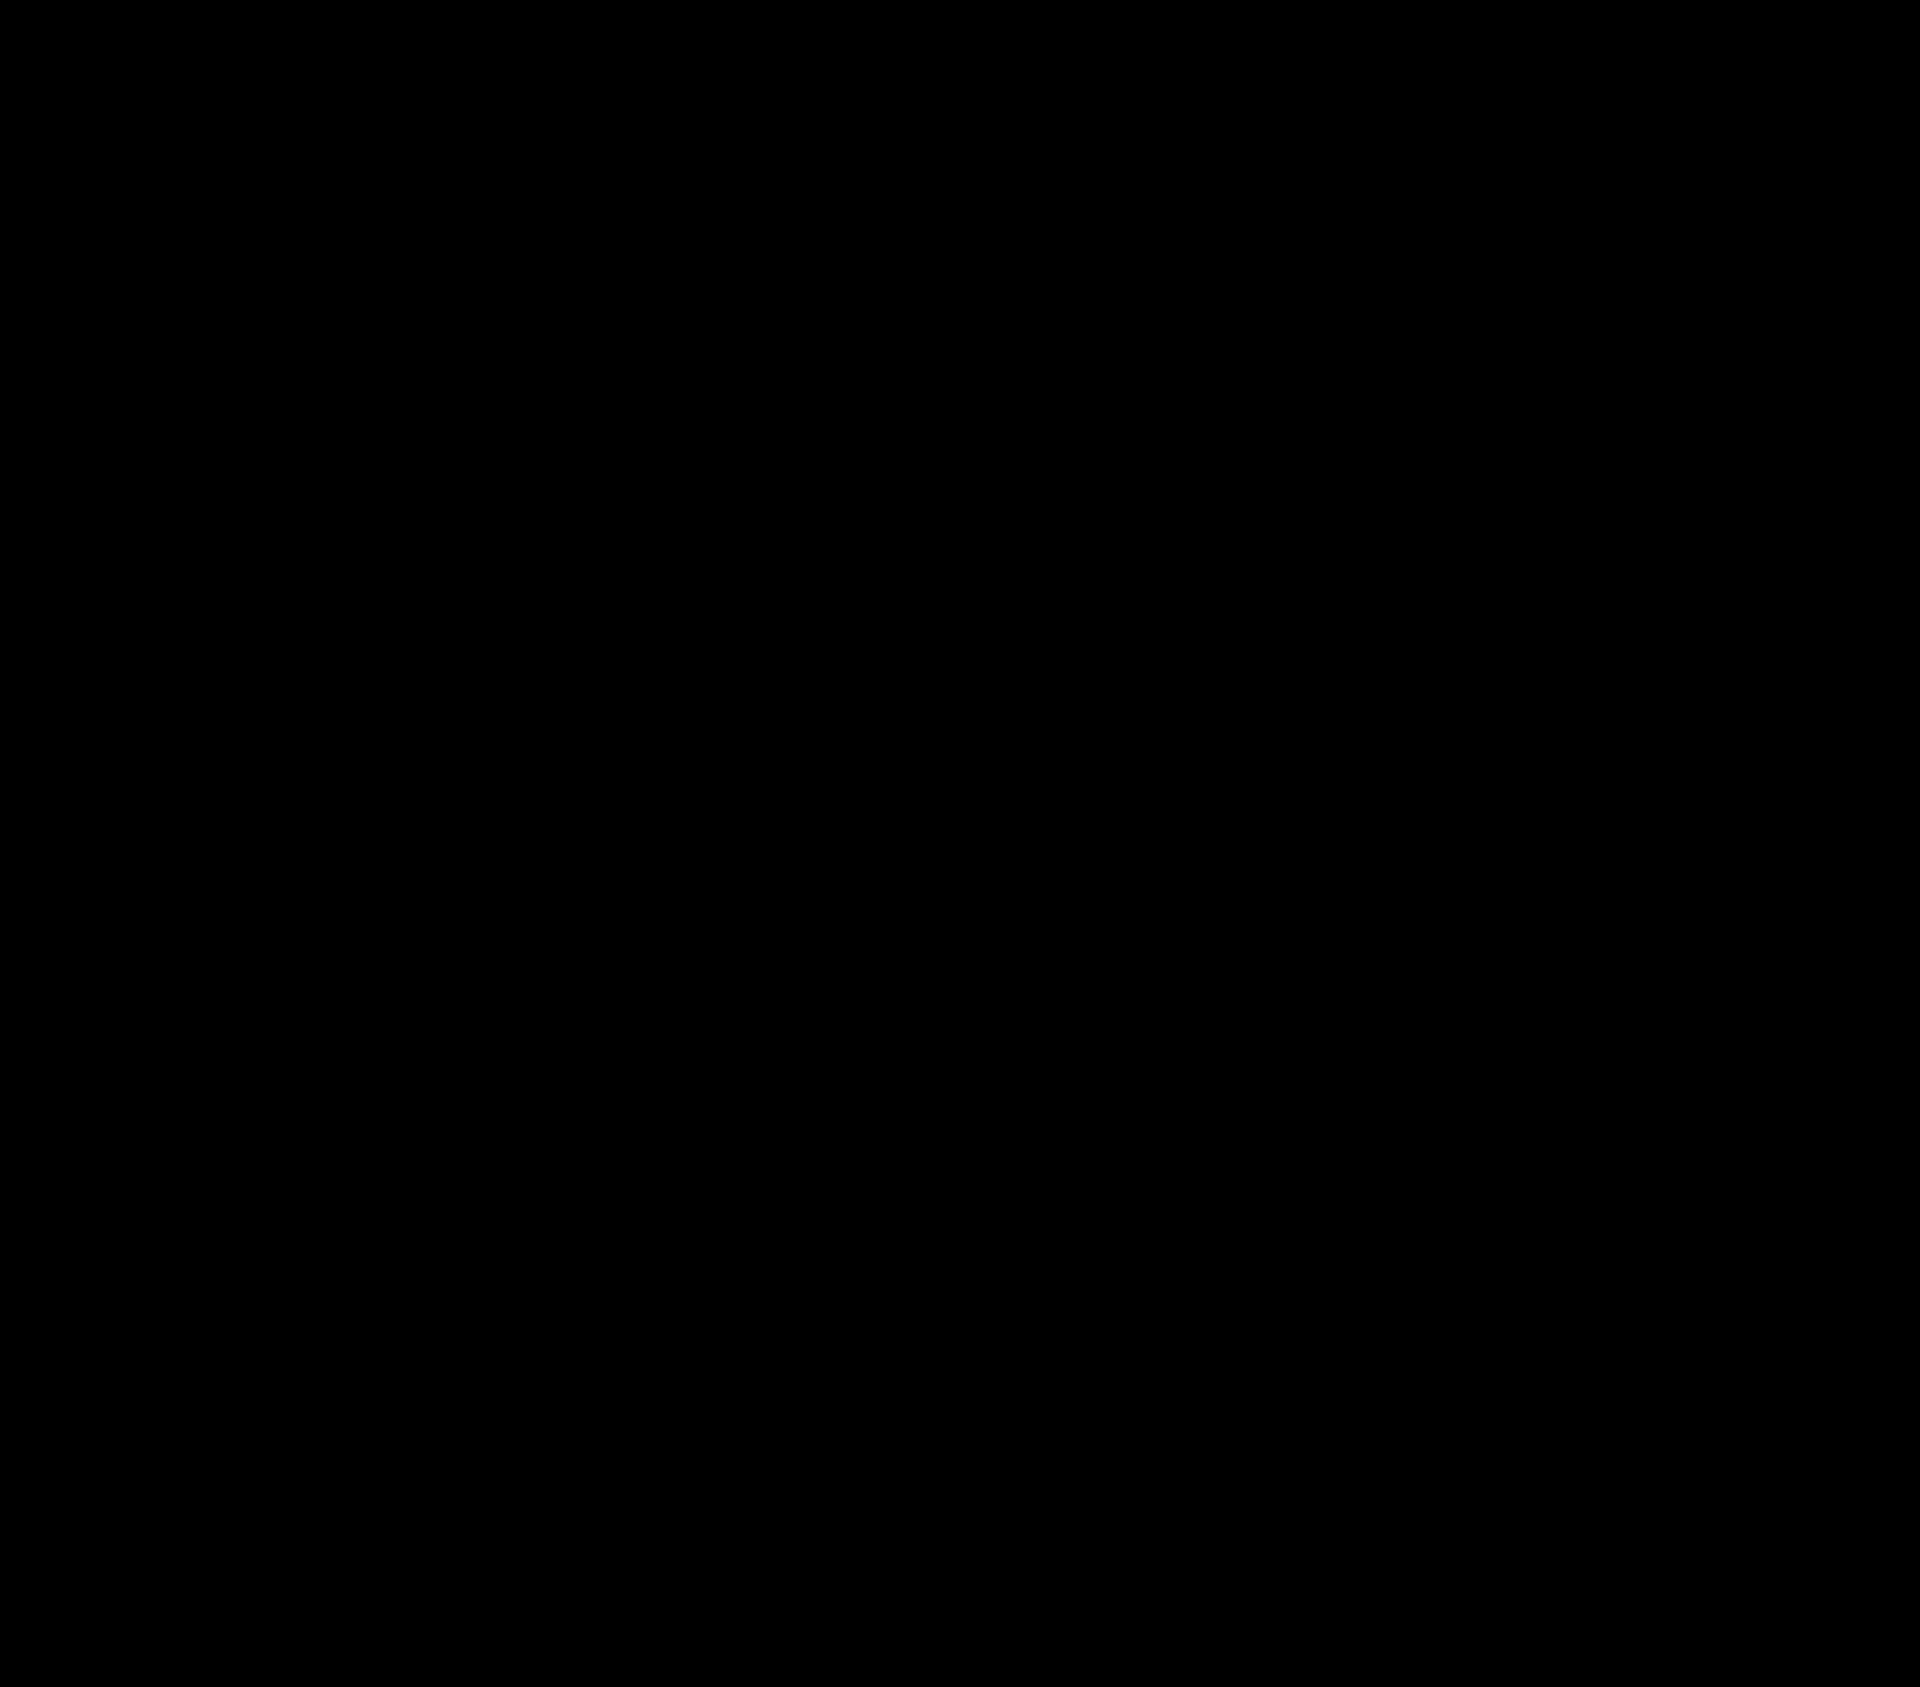 Logo 1501768001.png?ixlib=rb 1.1